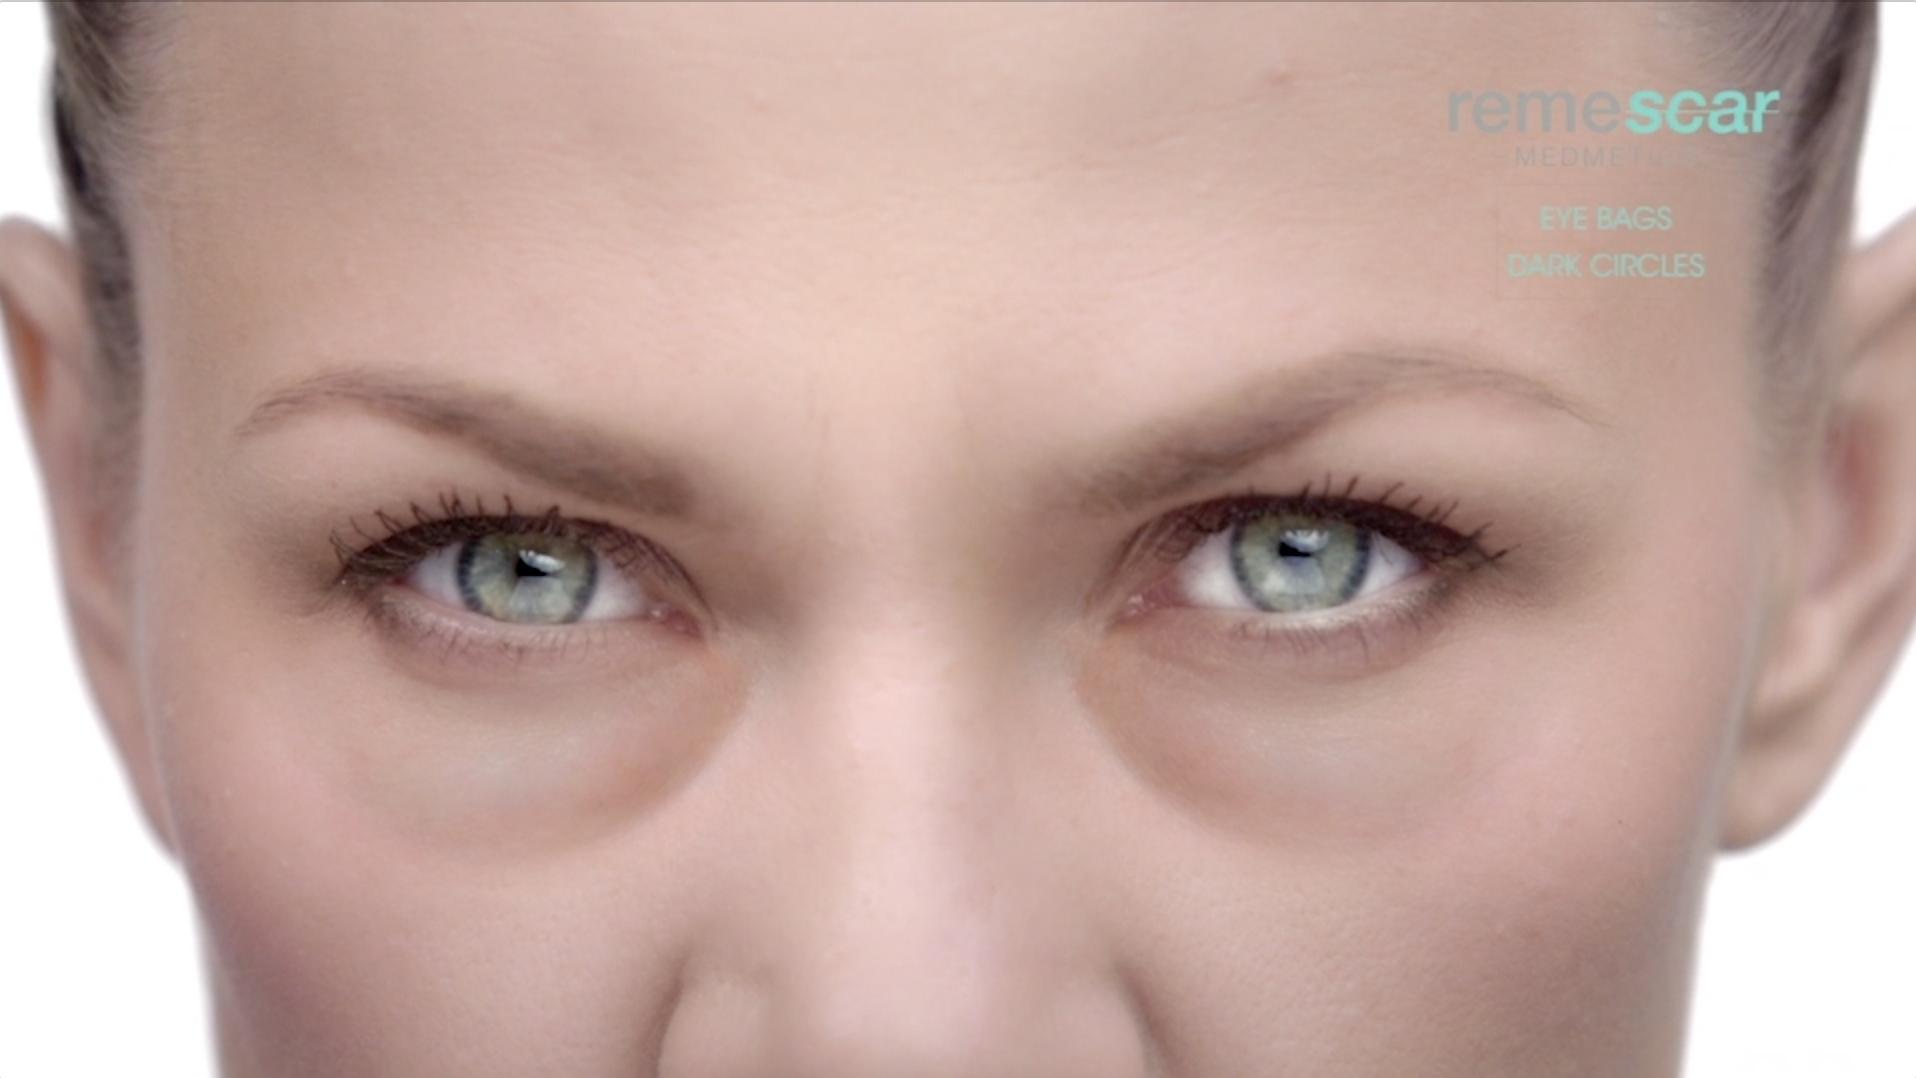 Remescar Eyebags 1